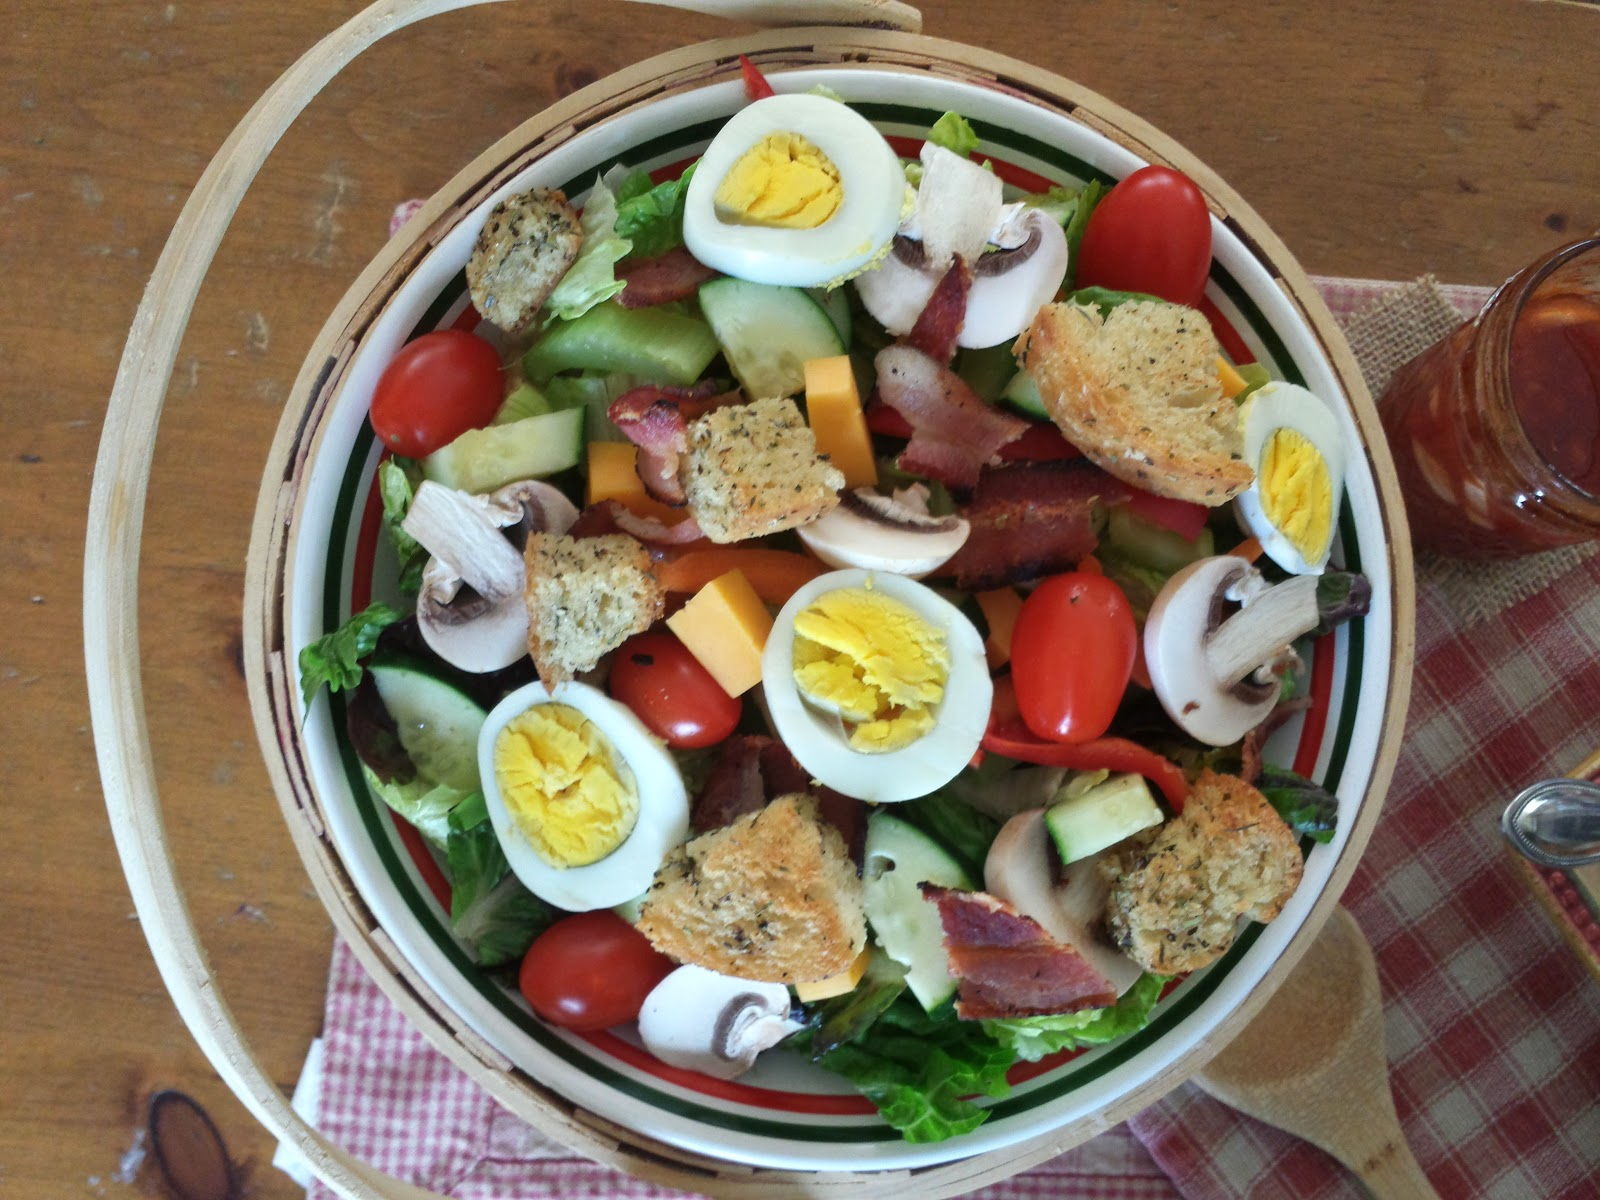 cobb salad in a basket